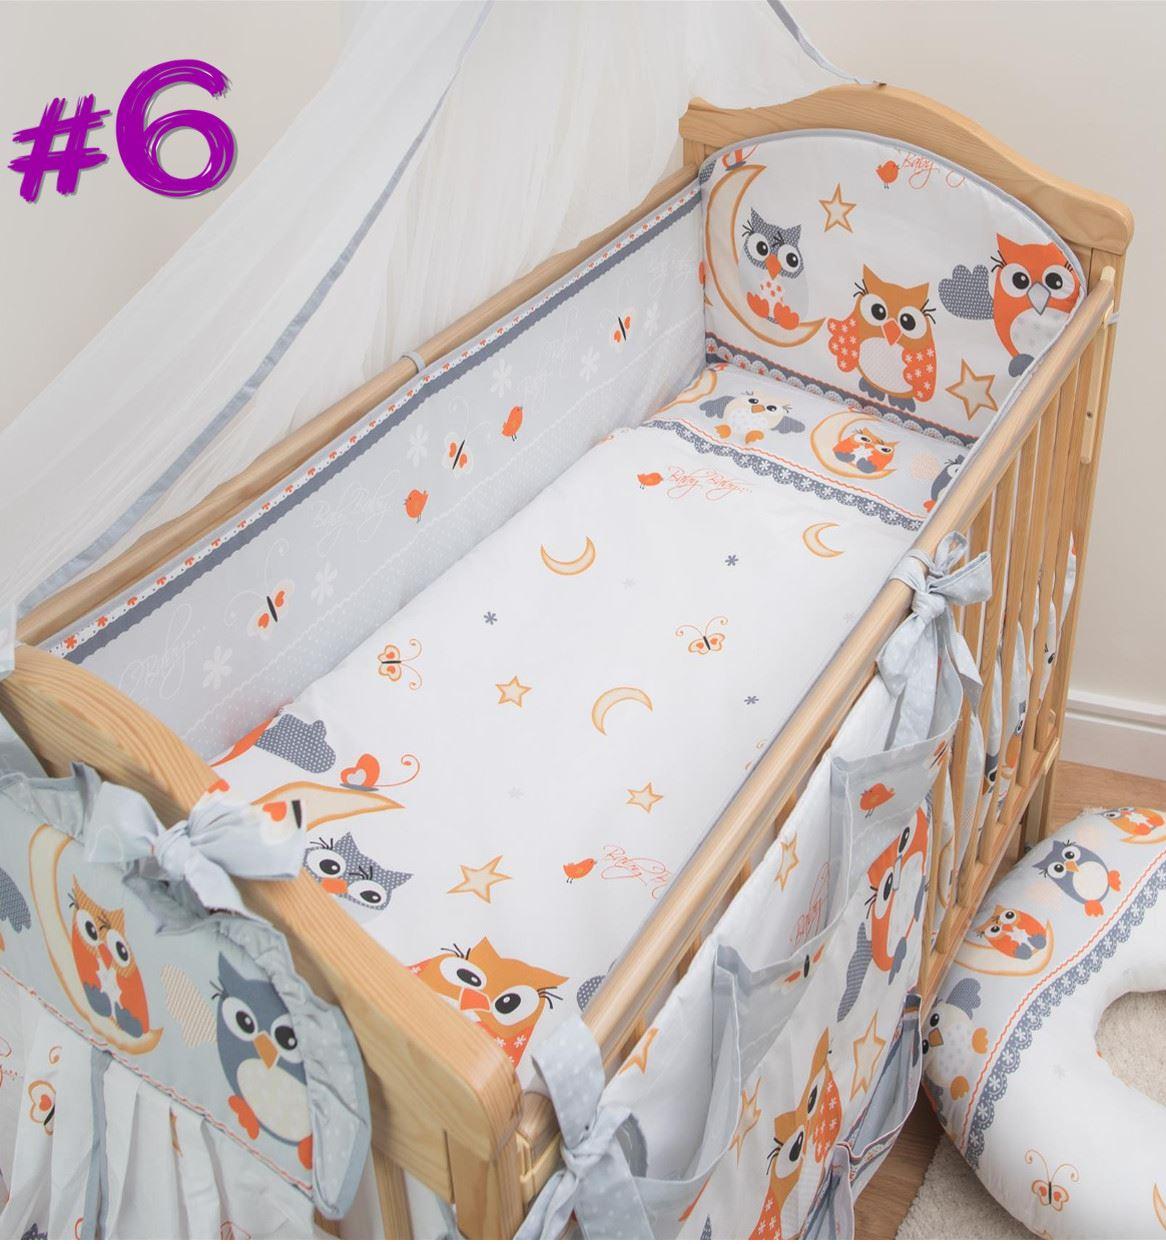 luxuri s 3 teile kinderzimmer baby bettw sche set gitterbett kinderbett lang ebay. Black Bedroom Furniture Sets. Home Design Ideas